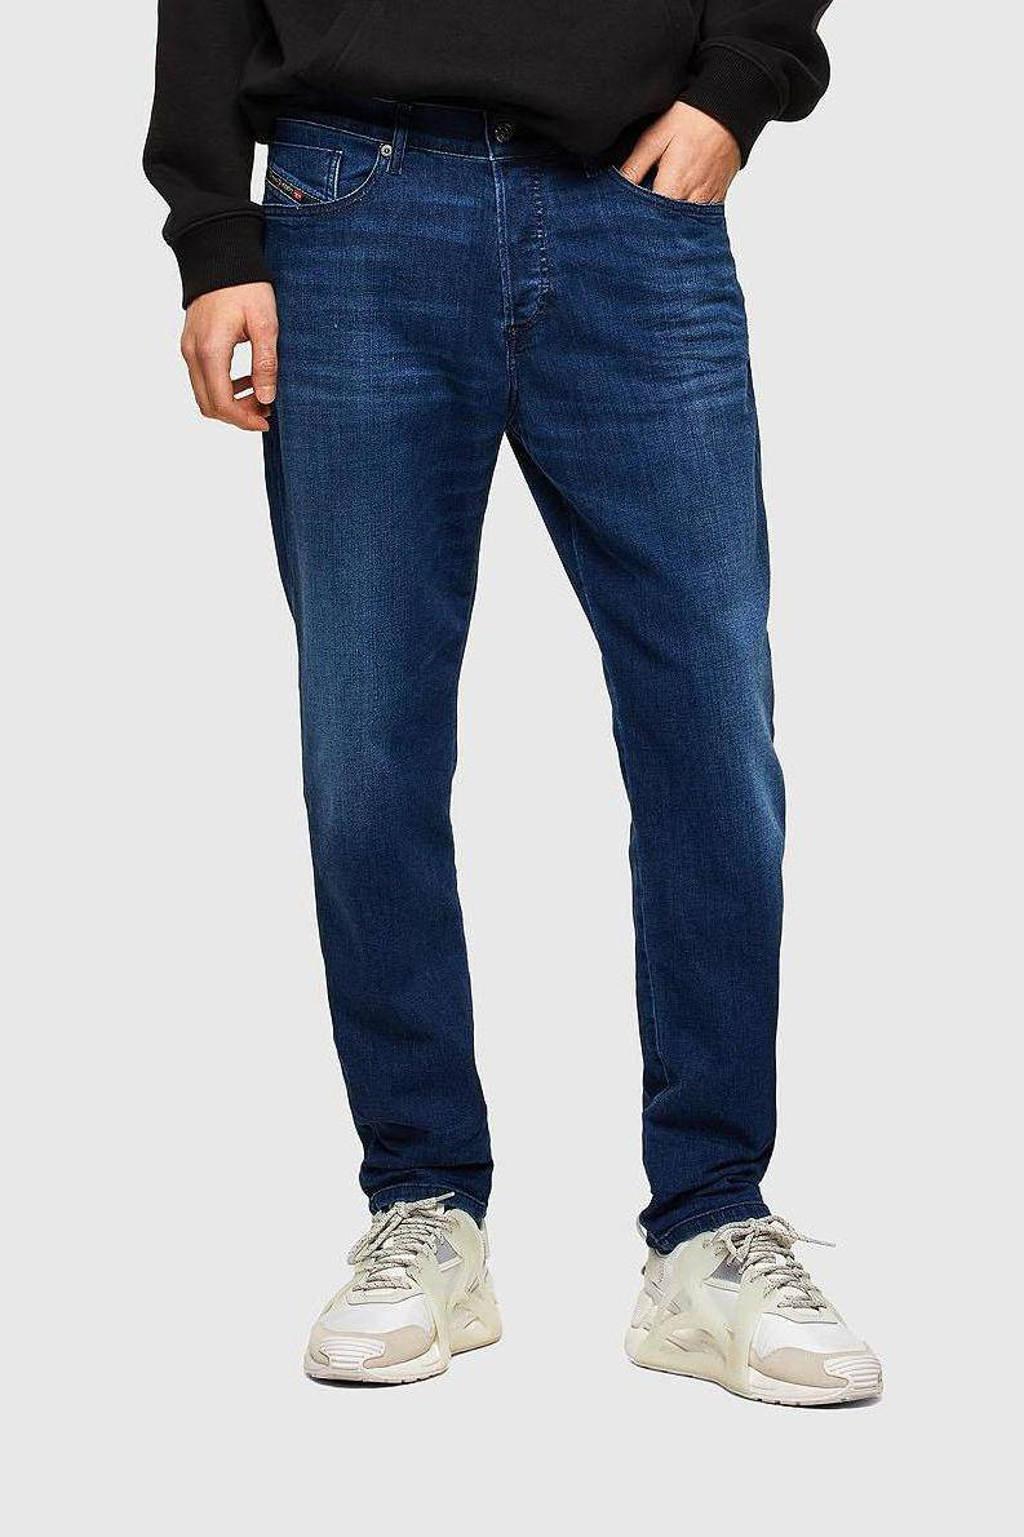 Diesel tapered fit jeans D-Fining 01 dark blue, 01 Dark Blue